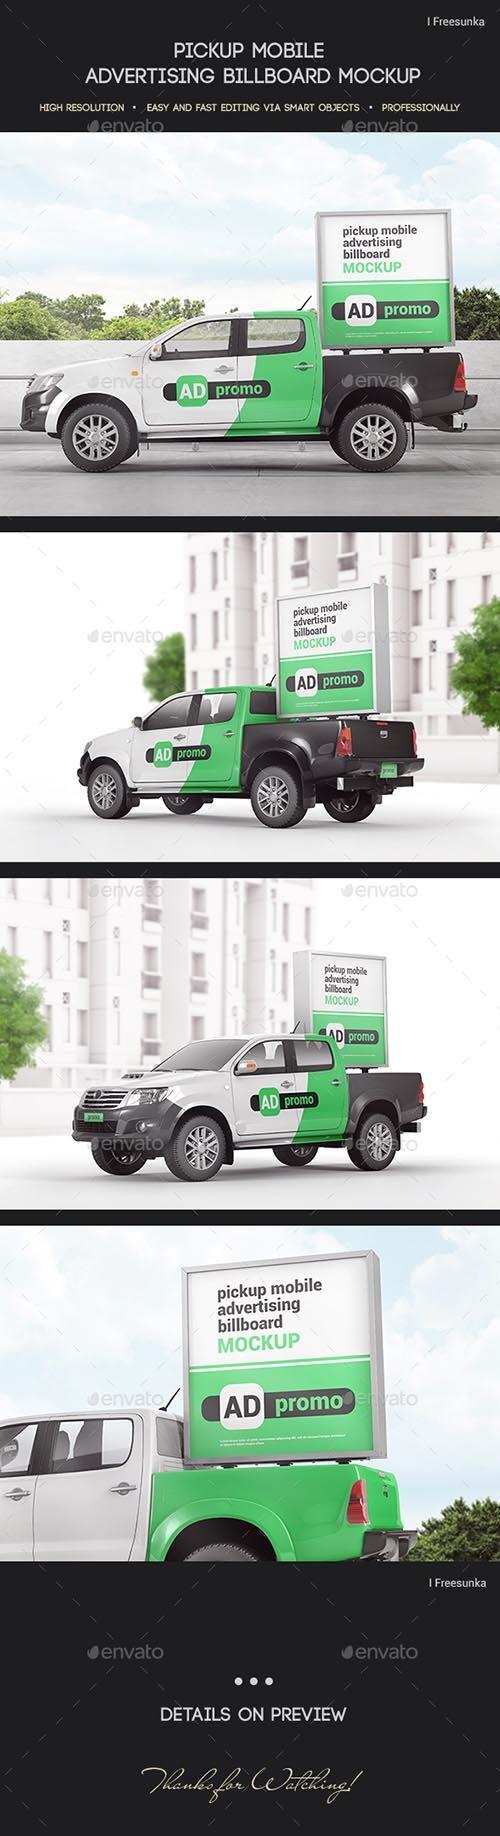 GraphicRiver - Pickup Mobile Advertising Billboard Mockup 27681518